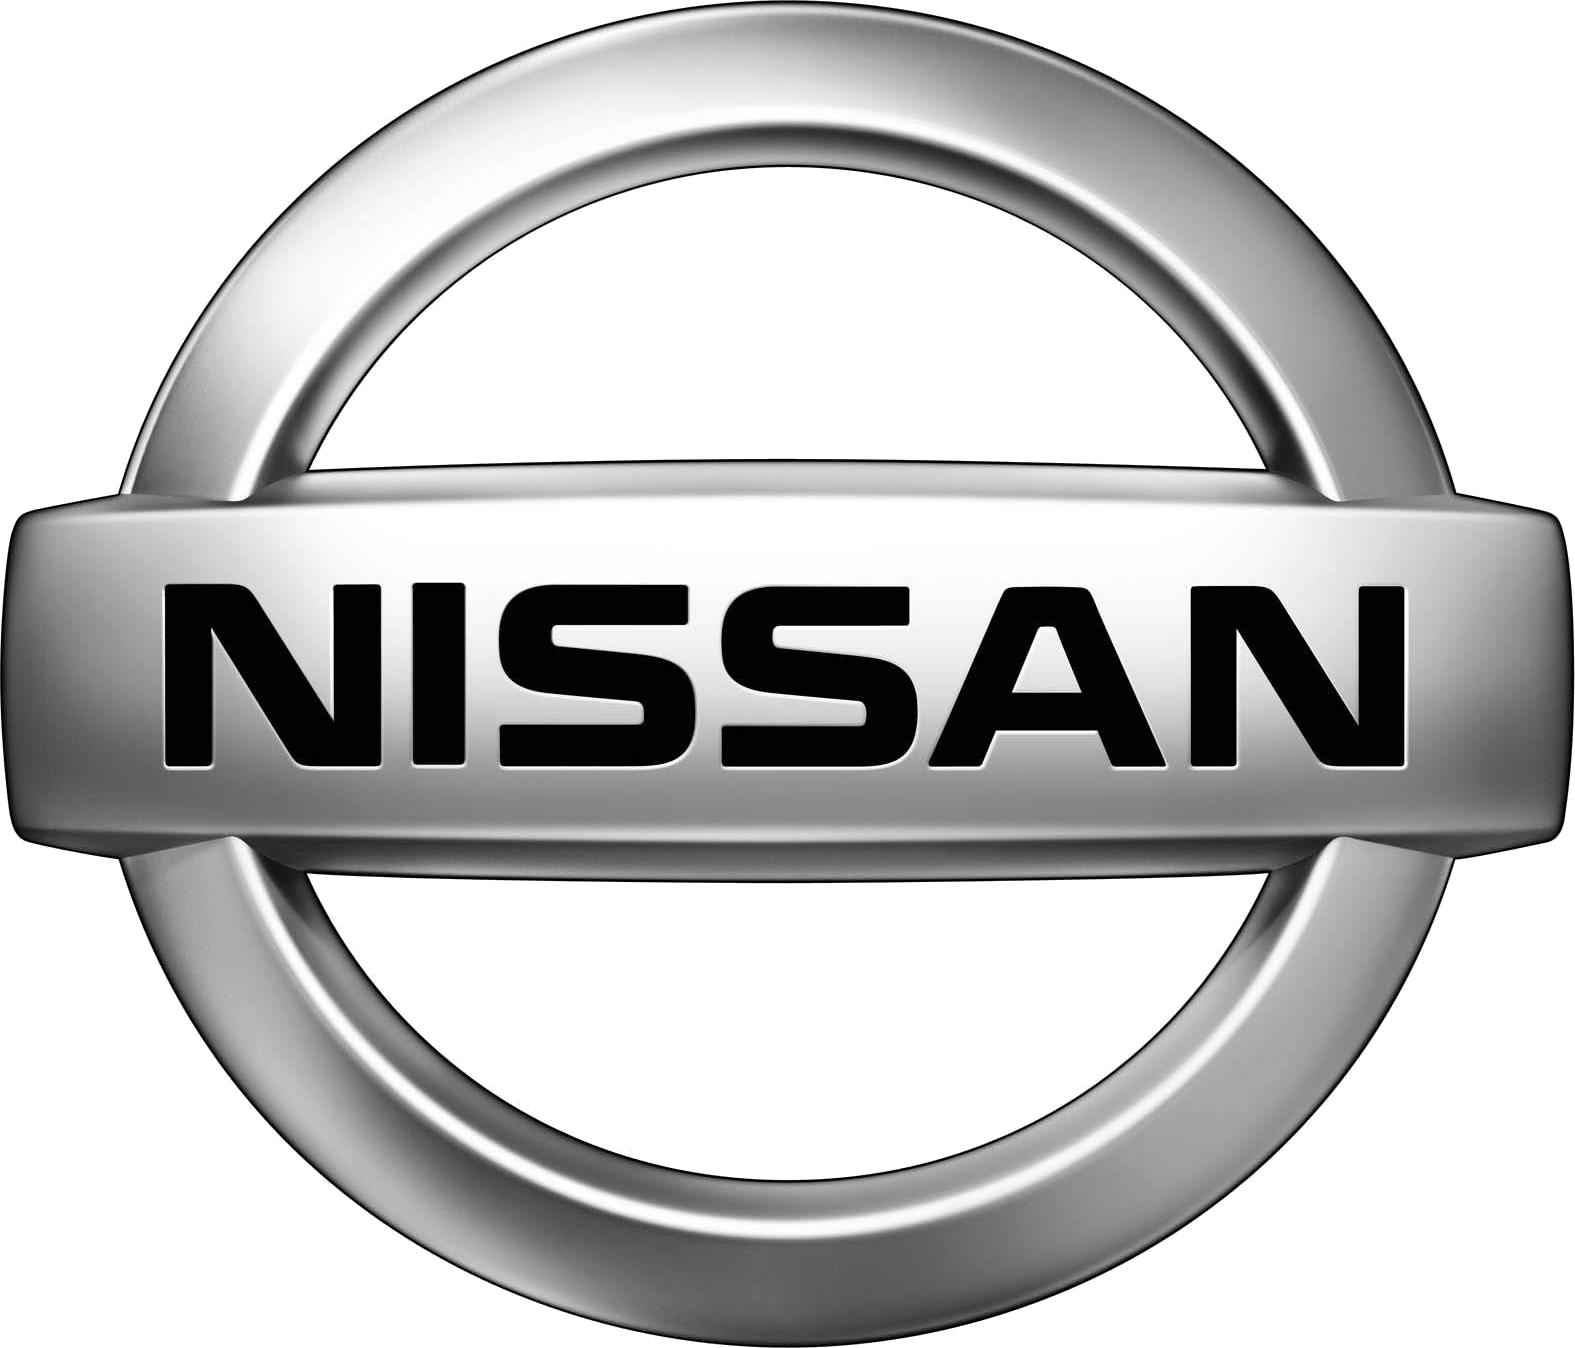 Nissan Master Certified, Advanced Auto Body II, Hardeeville, SC, 29927